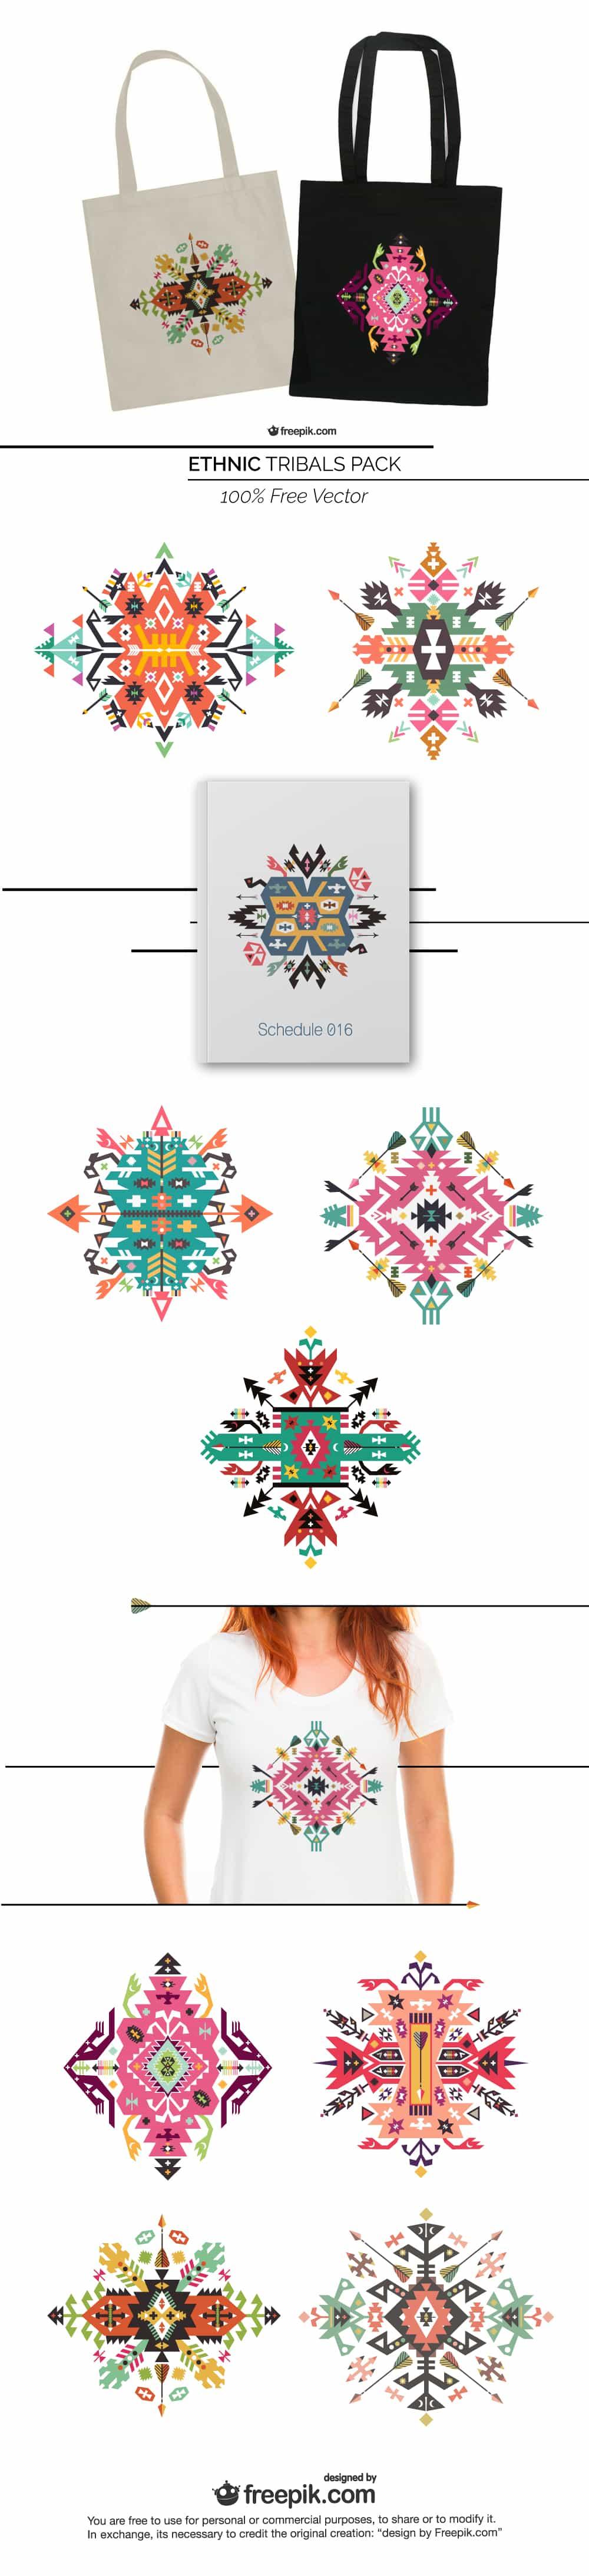 Ethnic Tribal Designs